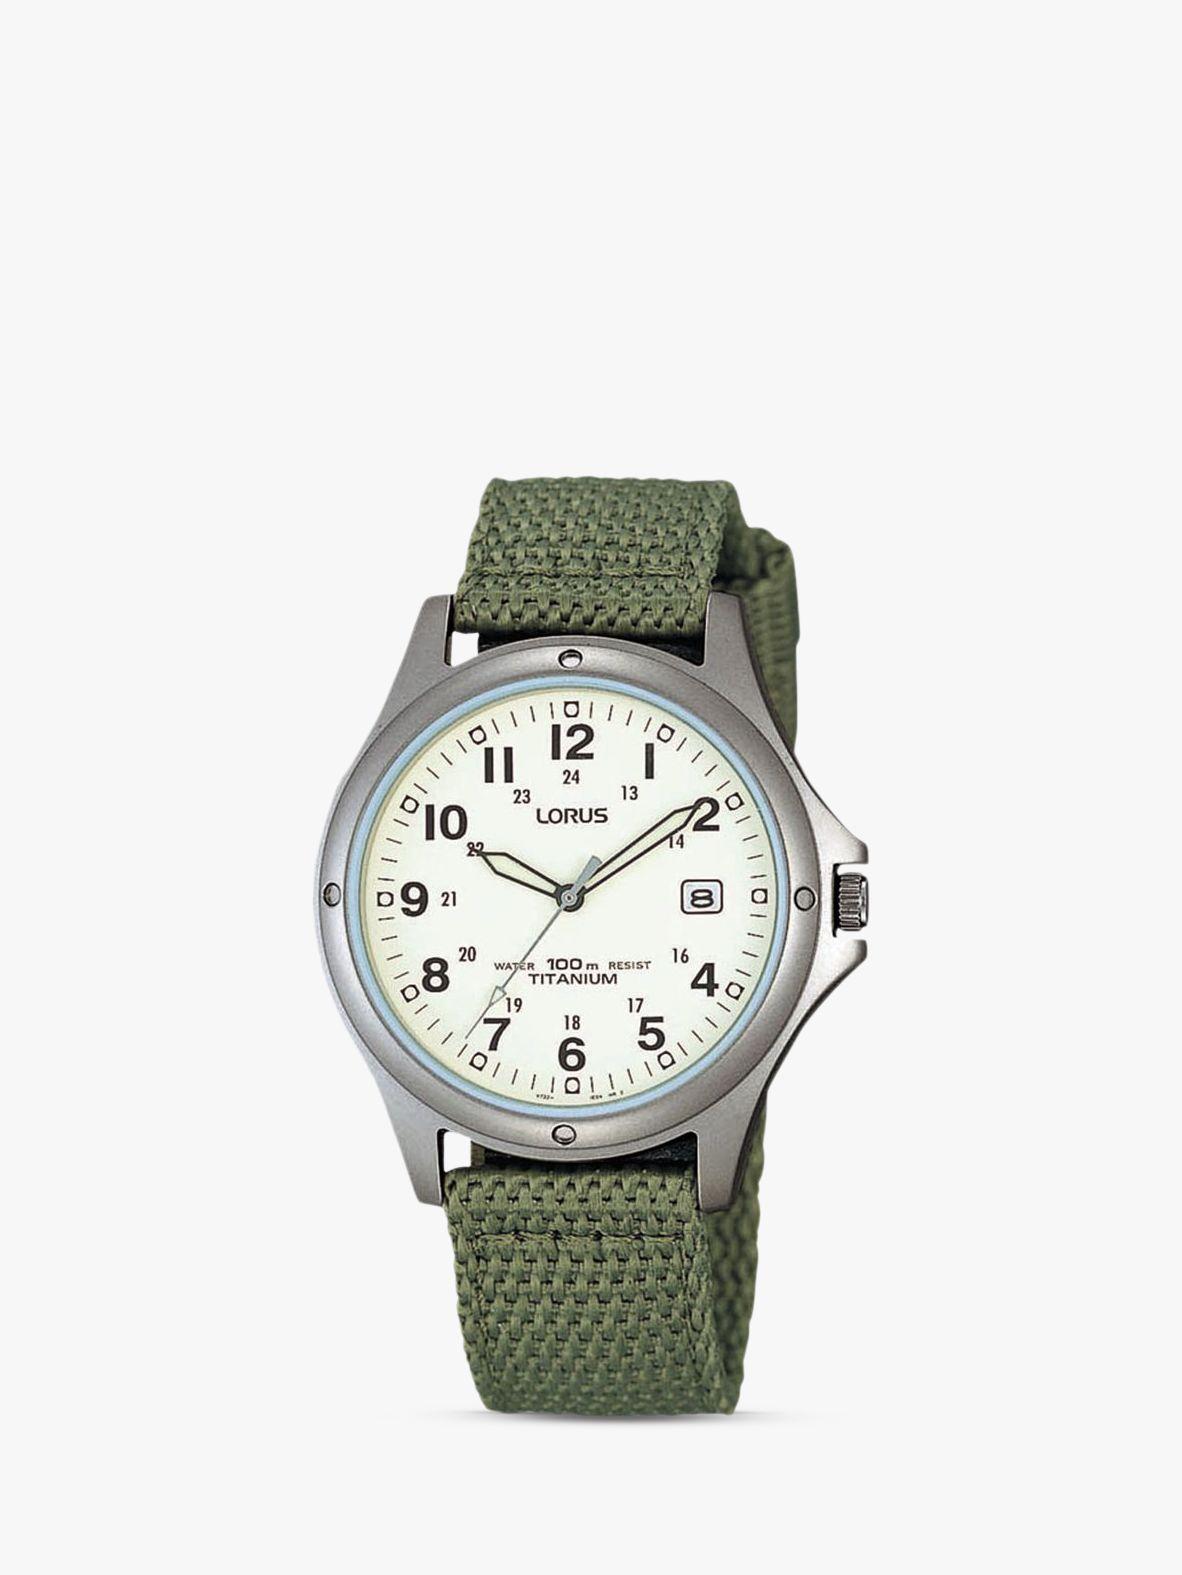 Lorus Lorus RXD425L8 Men's Date Nylon Fabric Strap Watch, Military Green/Cream